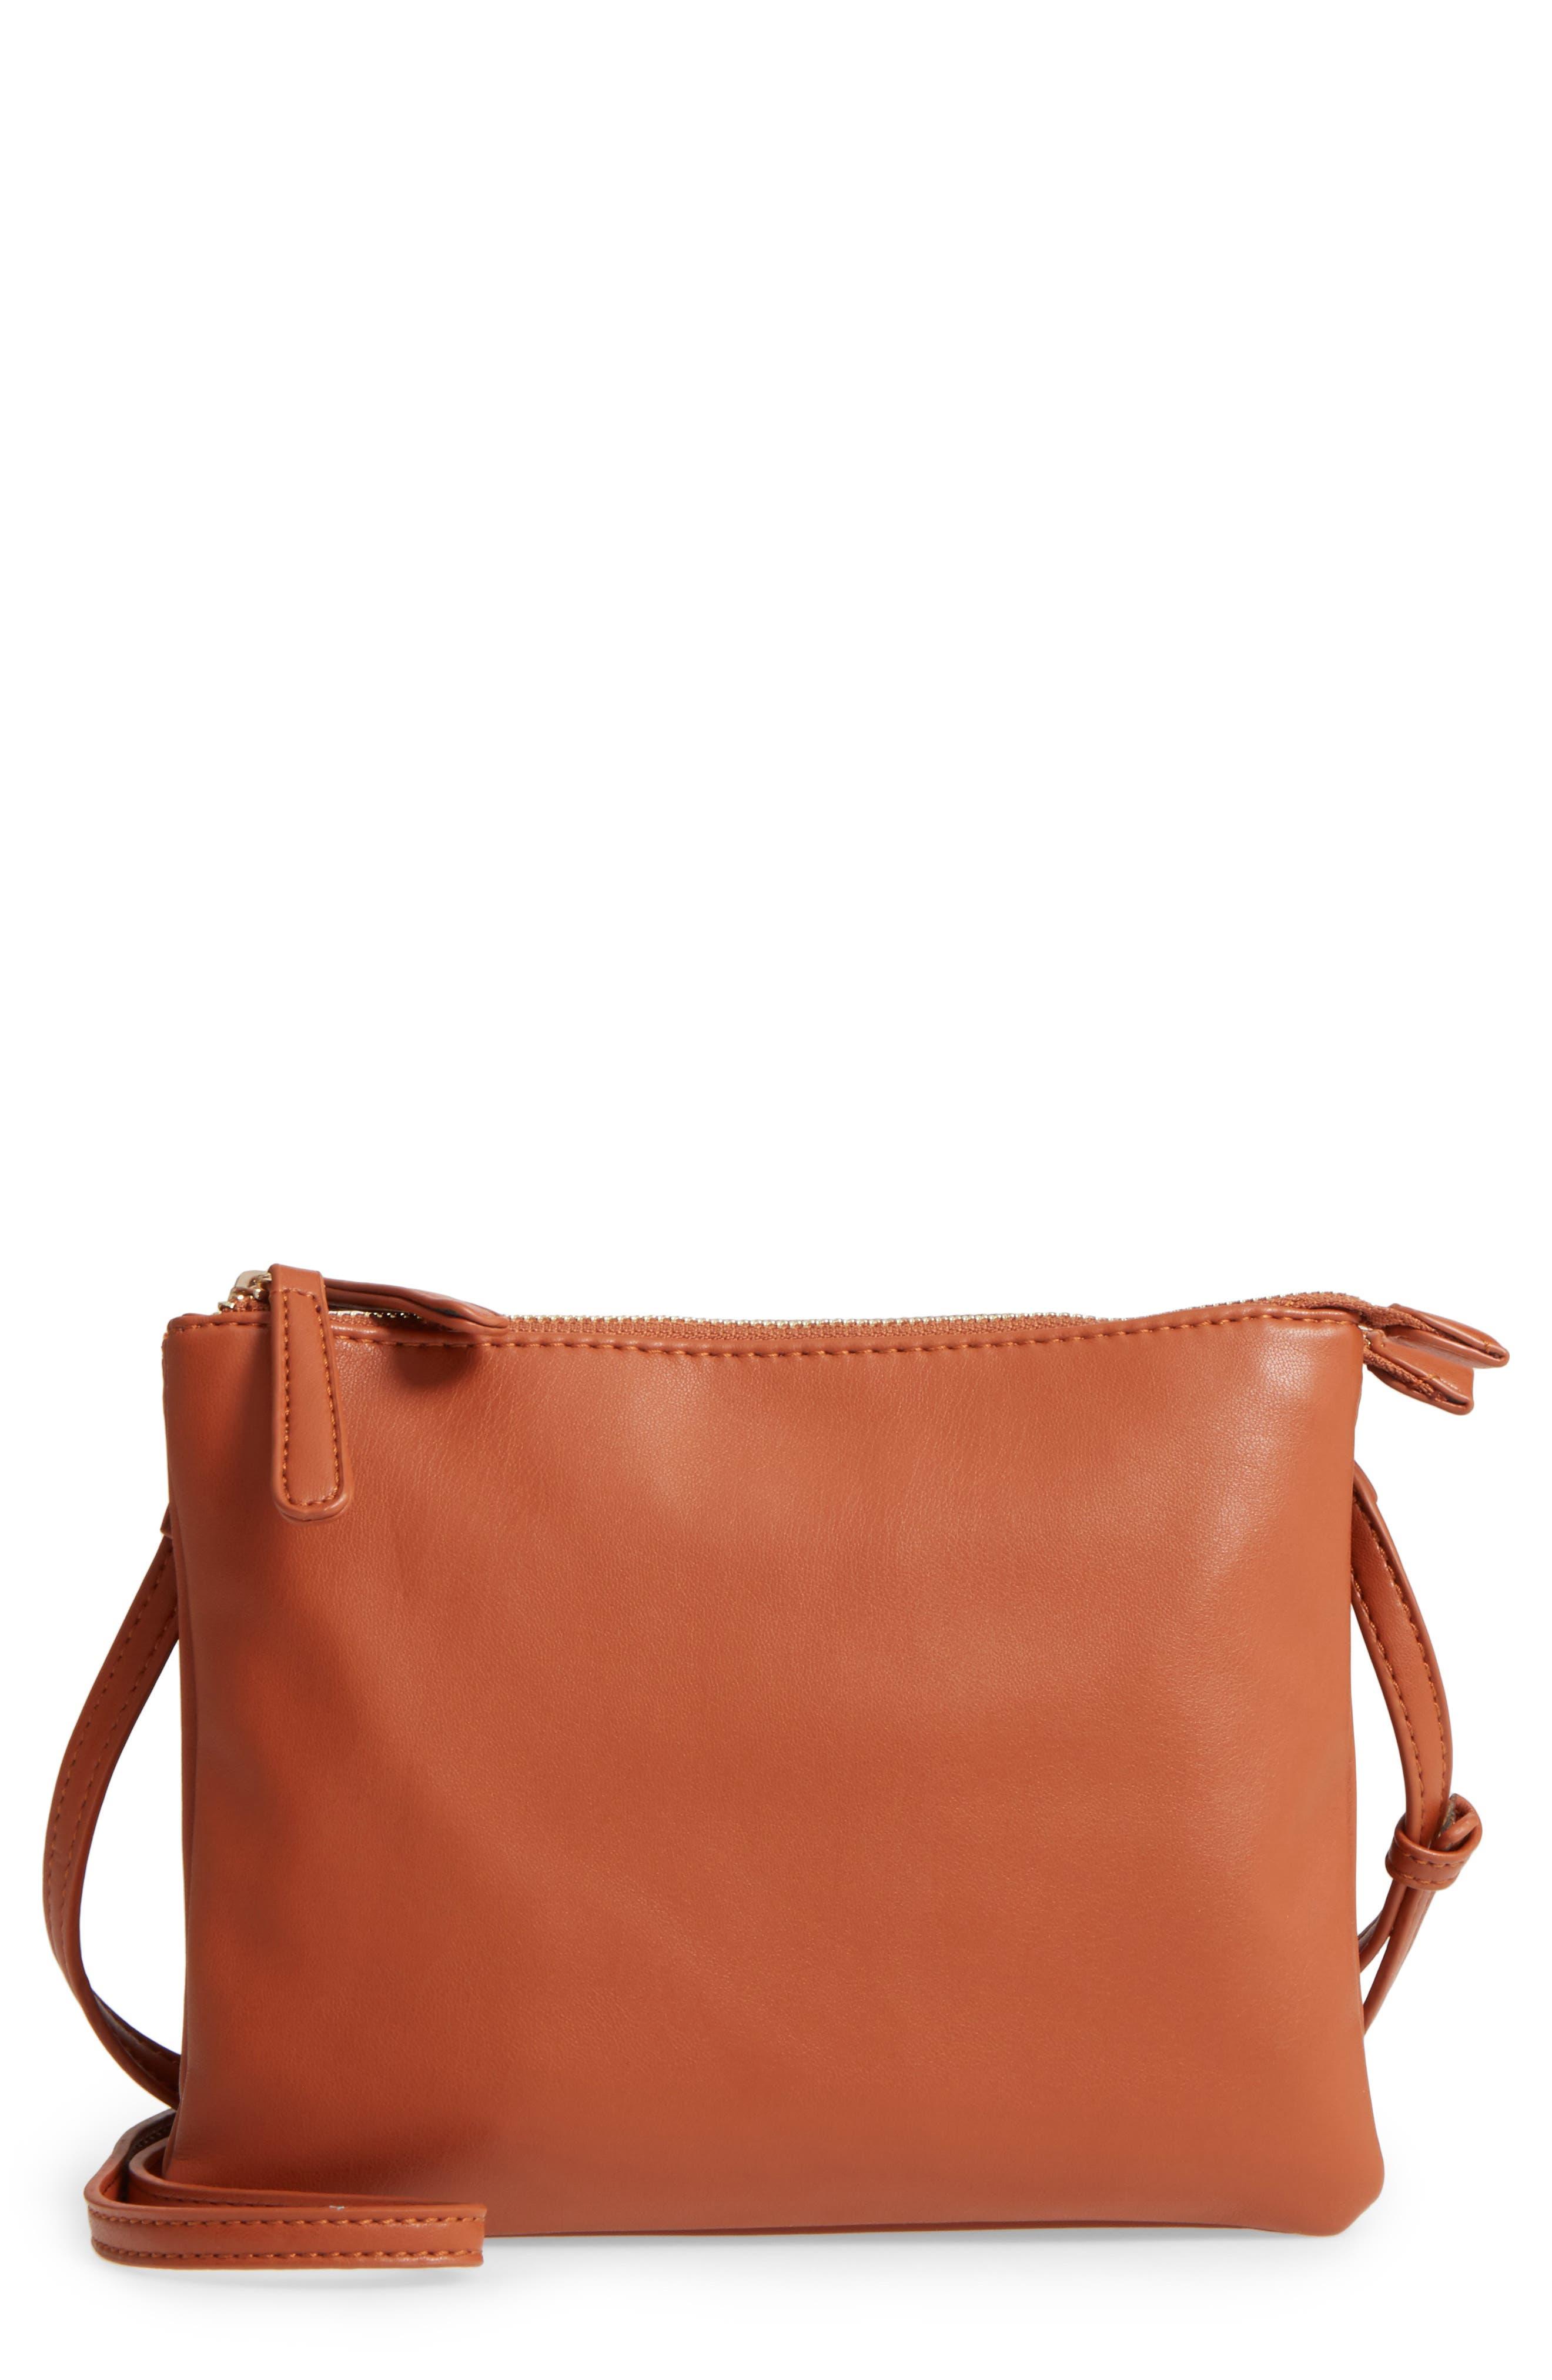 Madden Faux Leather Pouch Crossbody Bag,                         Main,                         color, Cognac